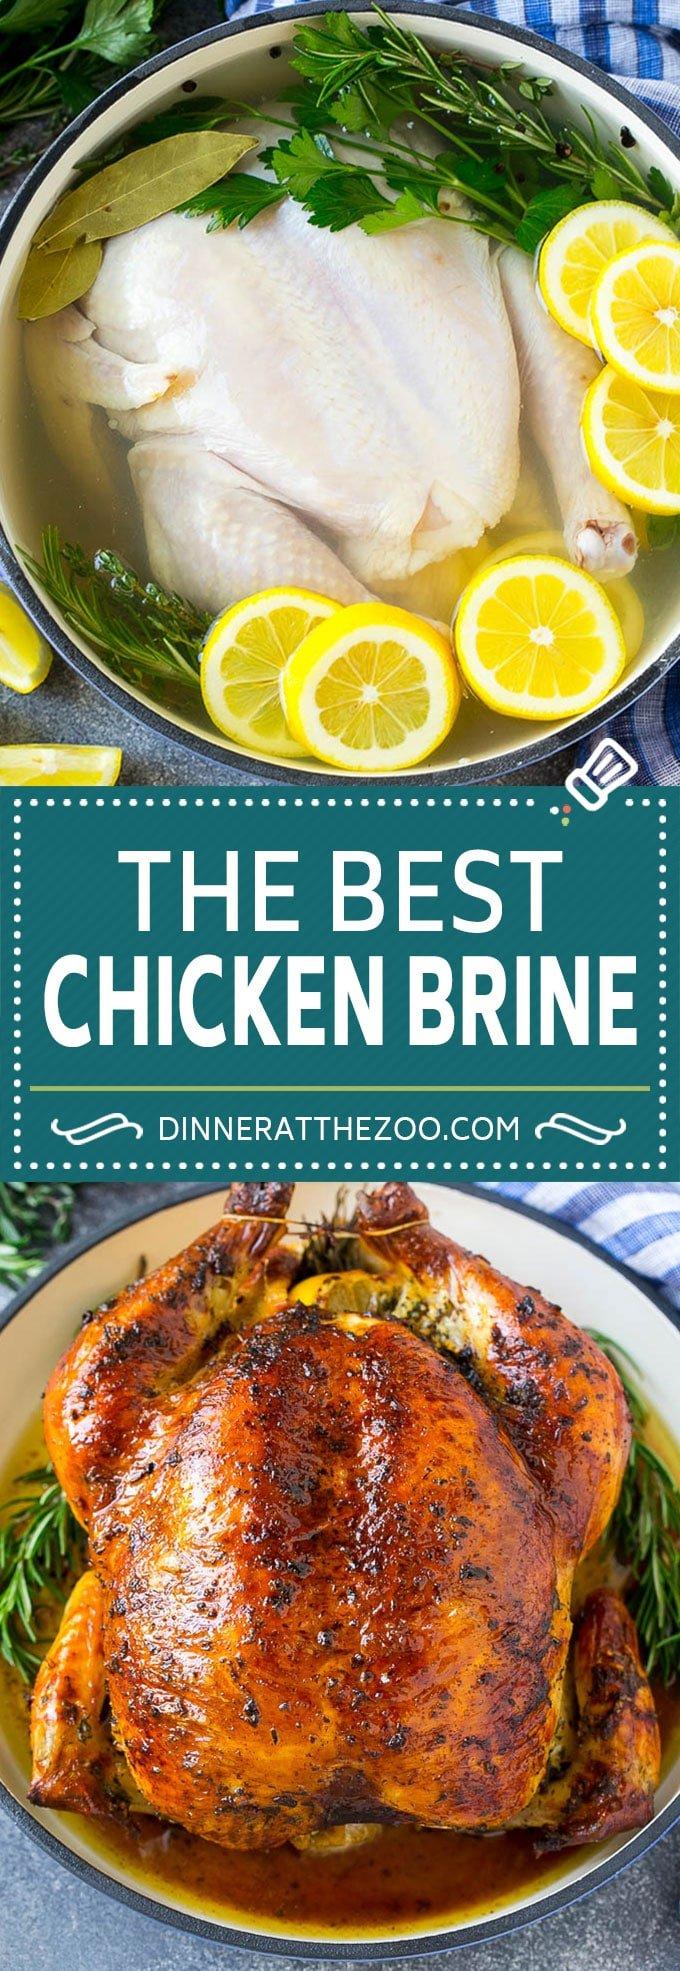 Chicken Brine Recipe - Dinner at the Zoo